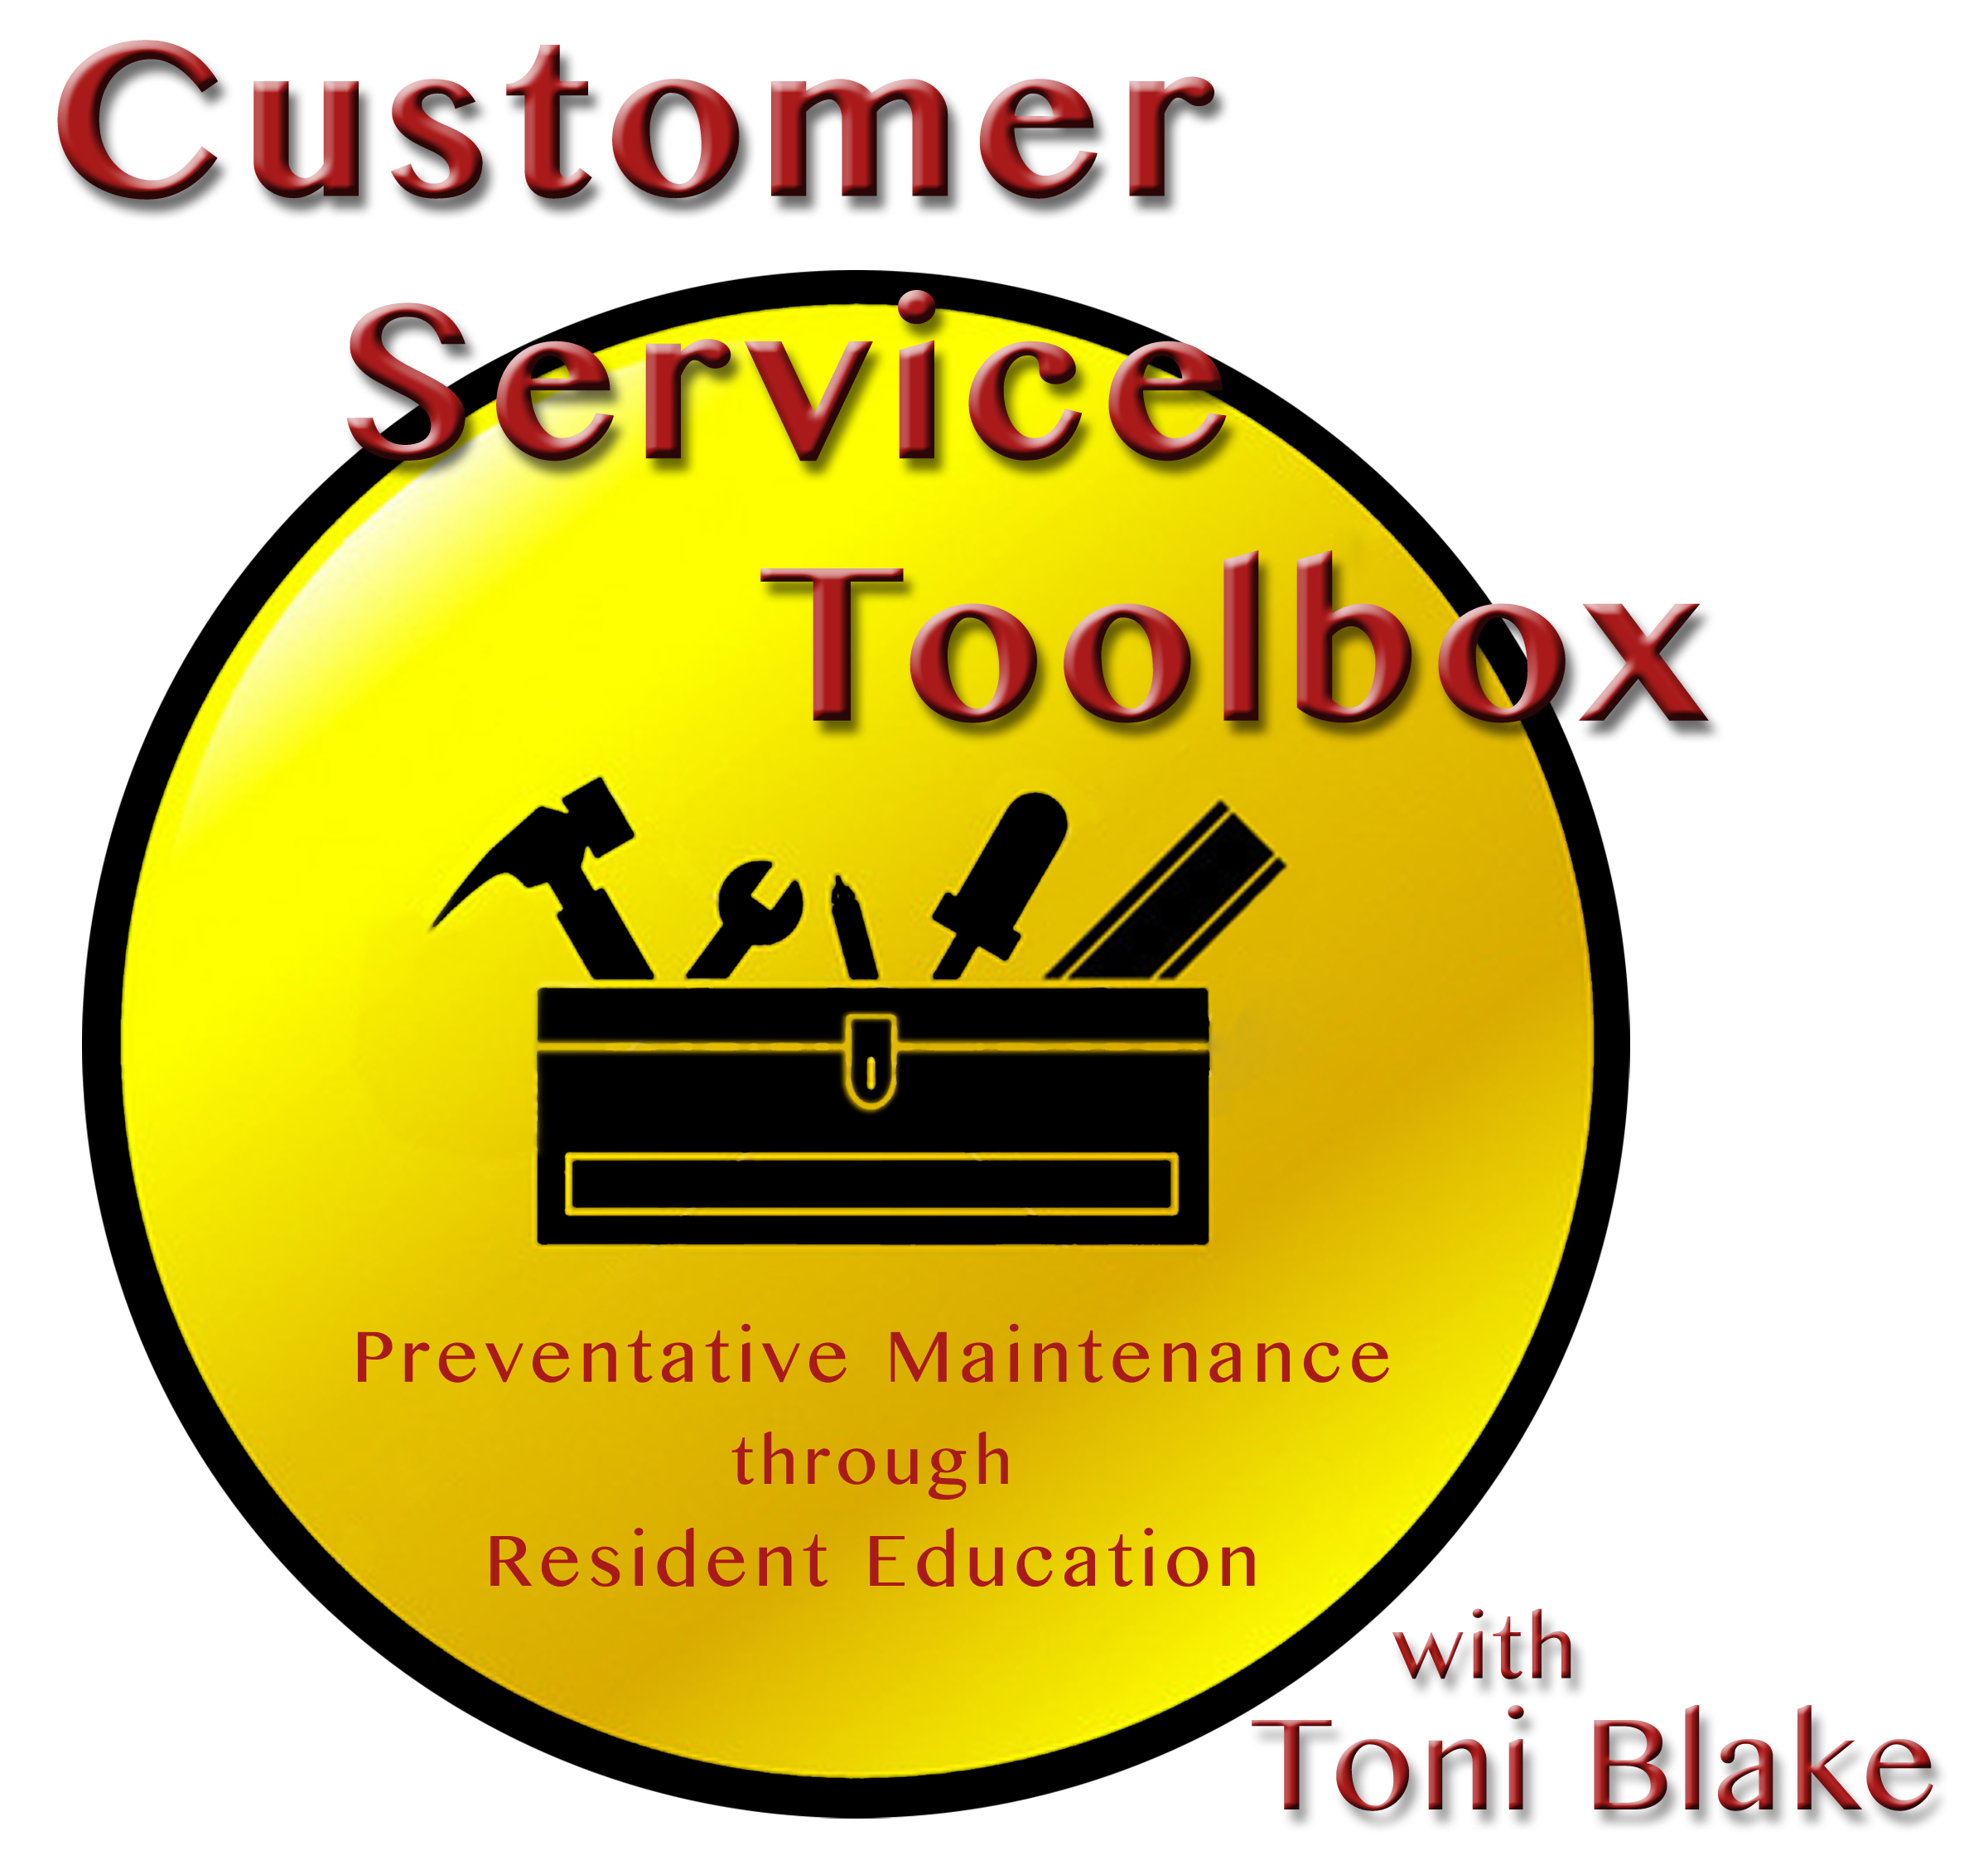 toolbox photo